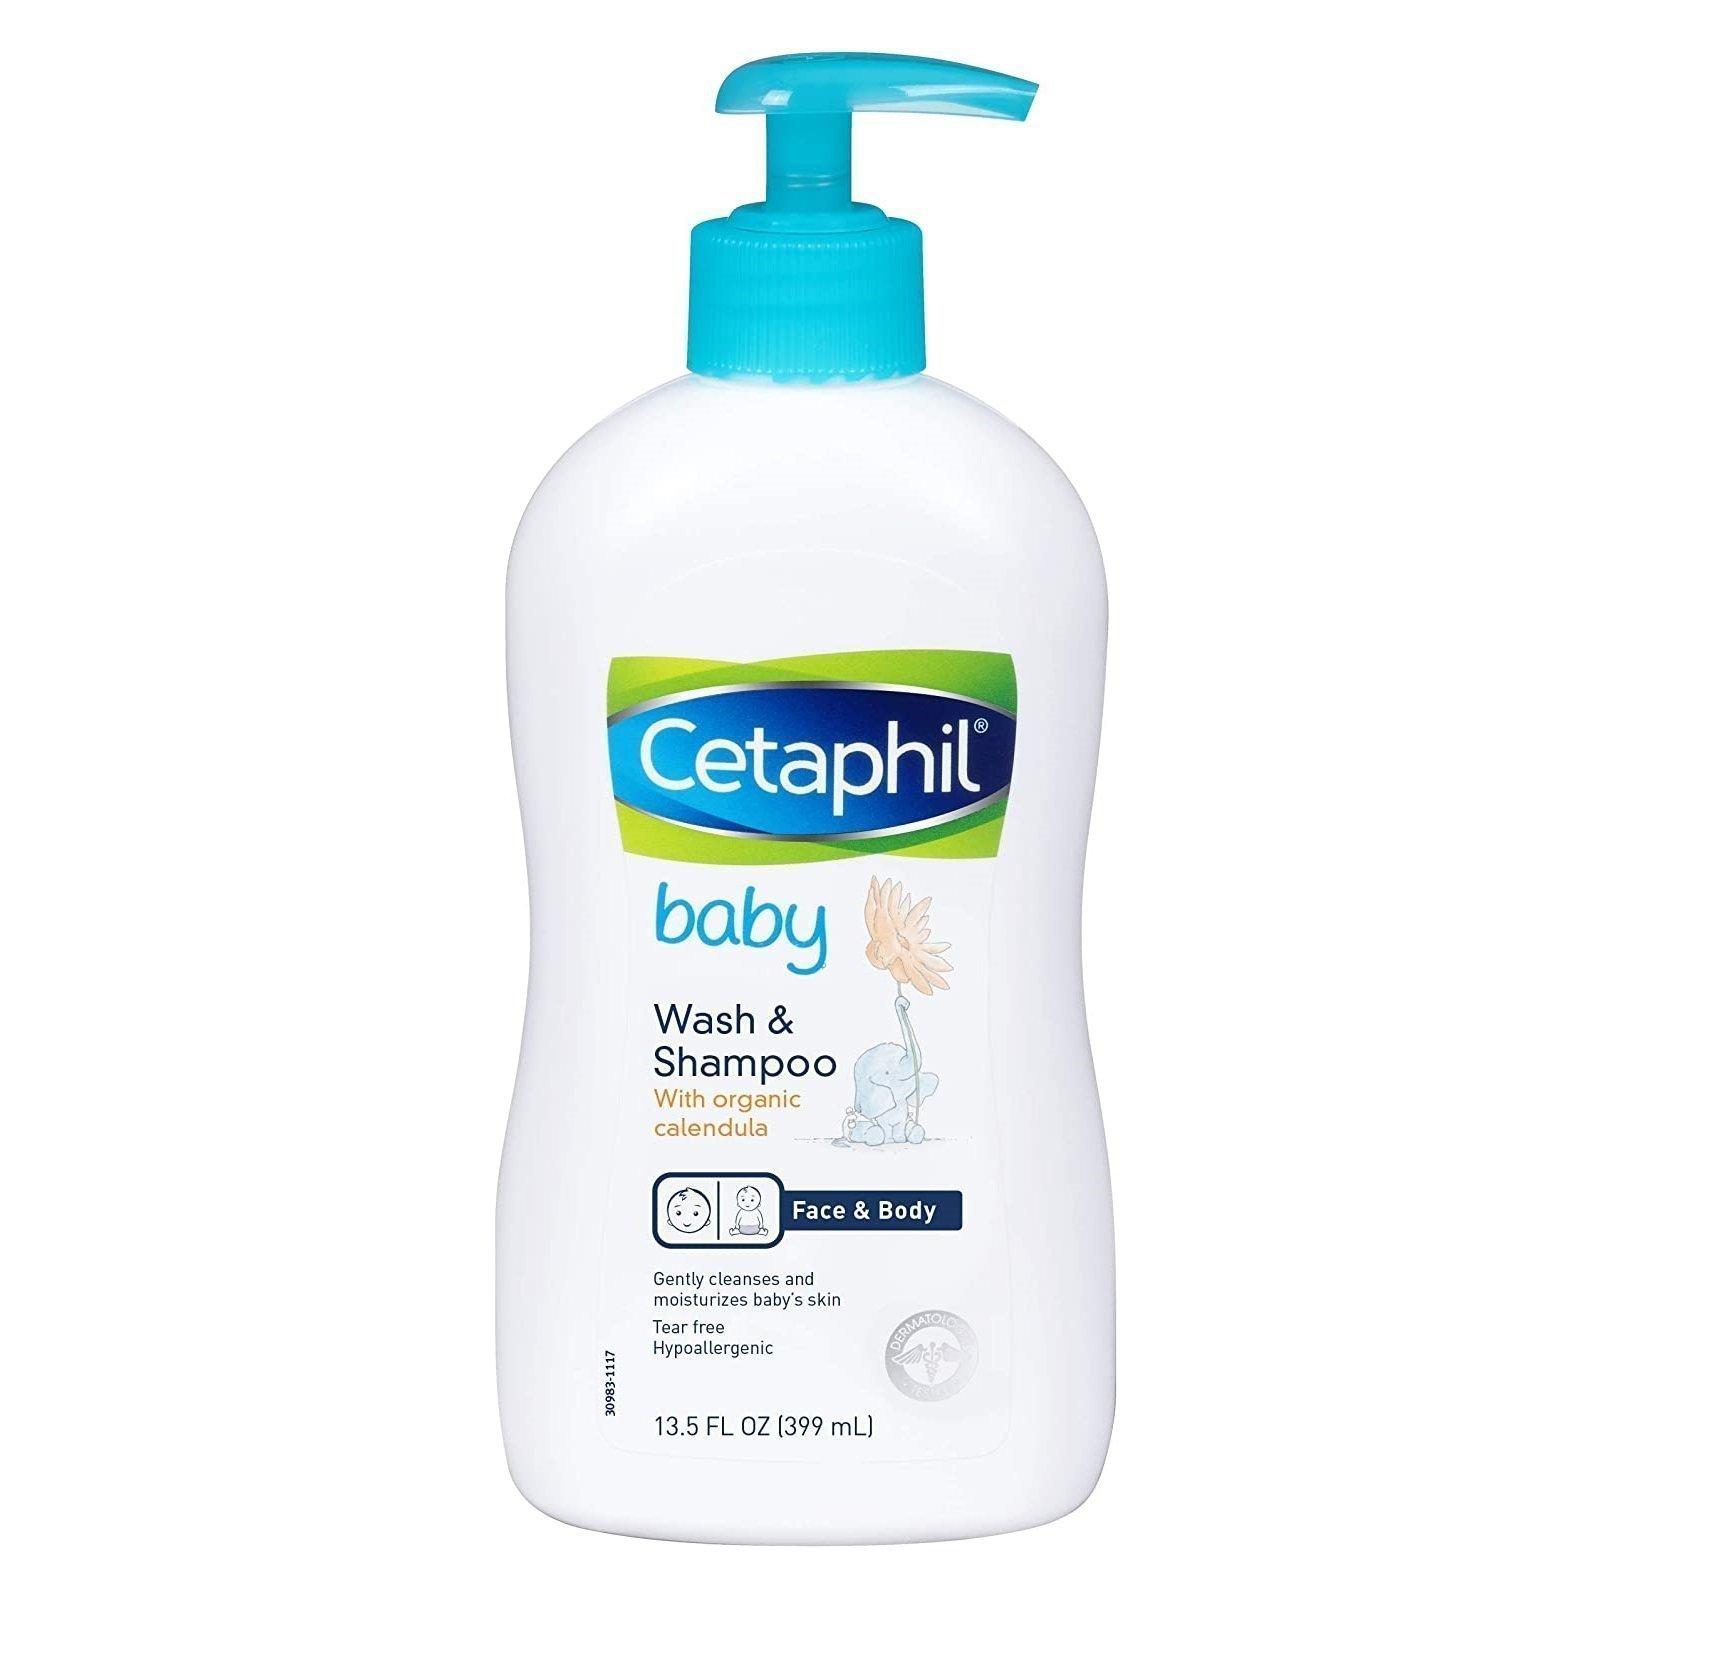 Cetaphil Baby Wash & Shampoo with Organic Calendula 13.5 FL OZ